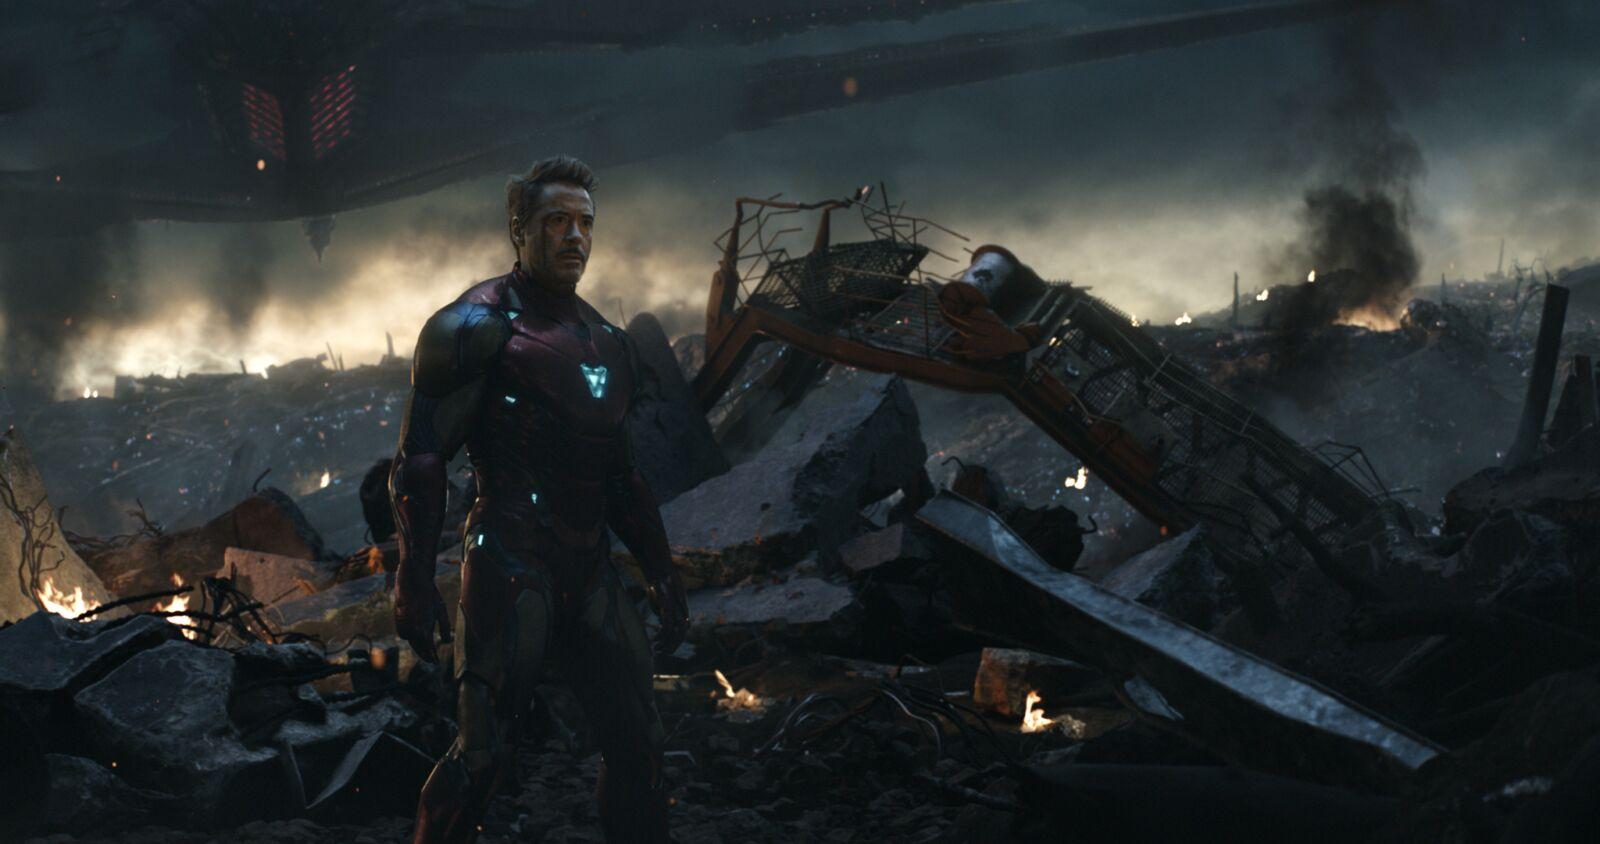 Joe Russo explains the heartbreaking reason why Tony Stark had to die